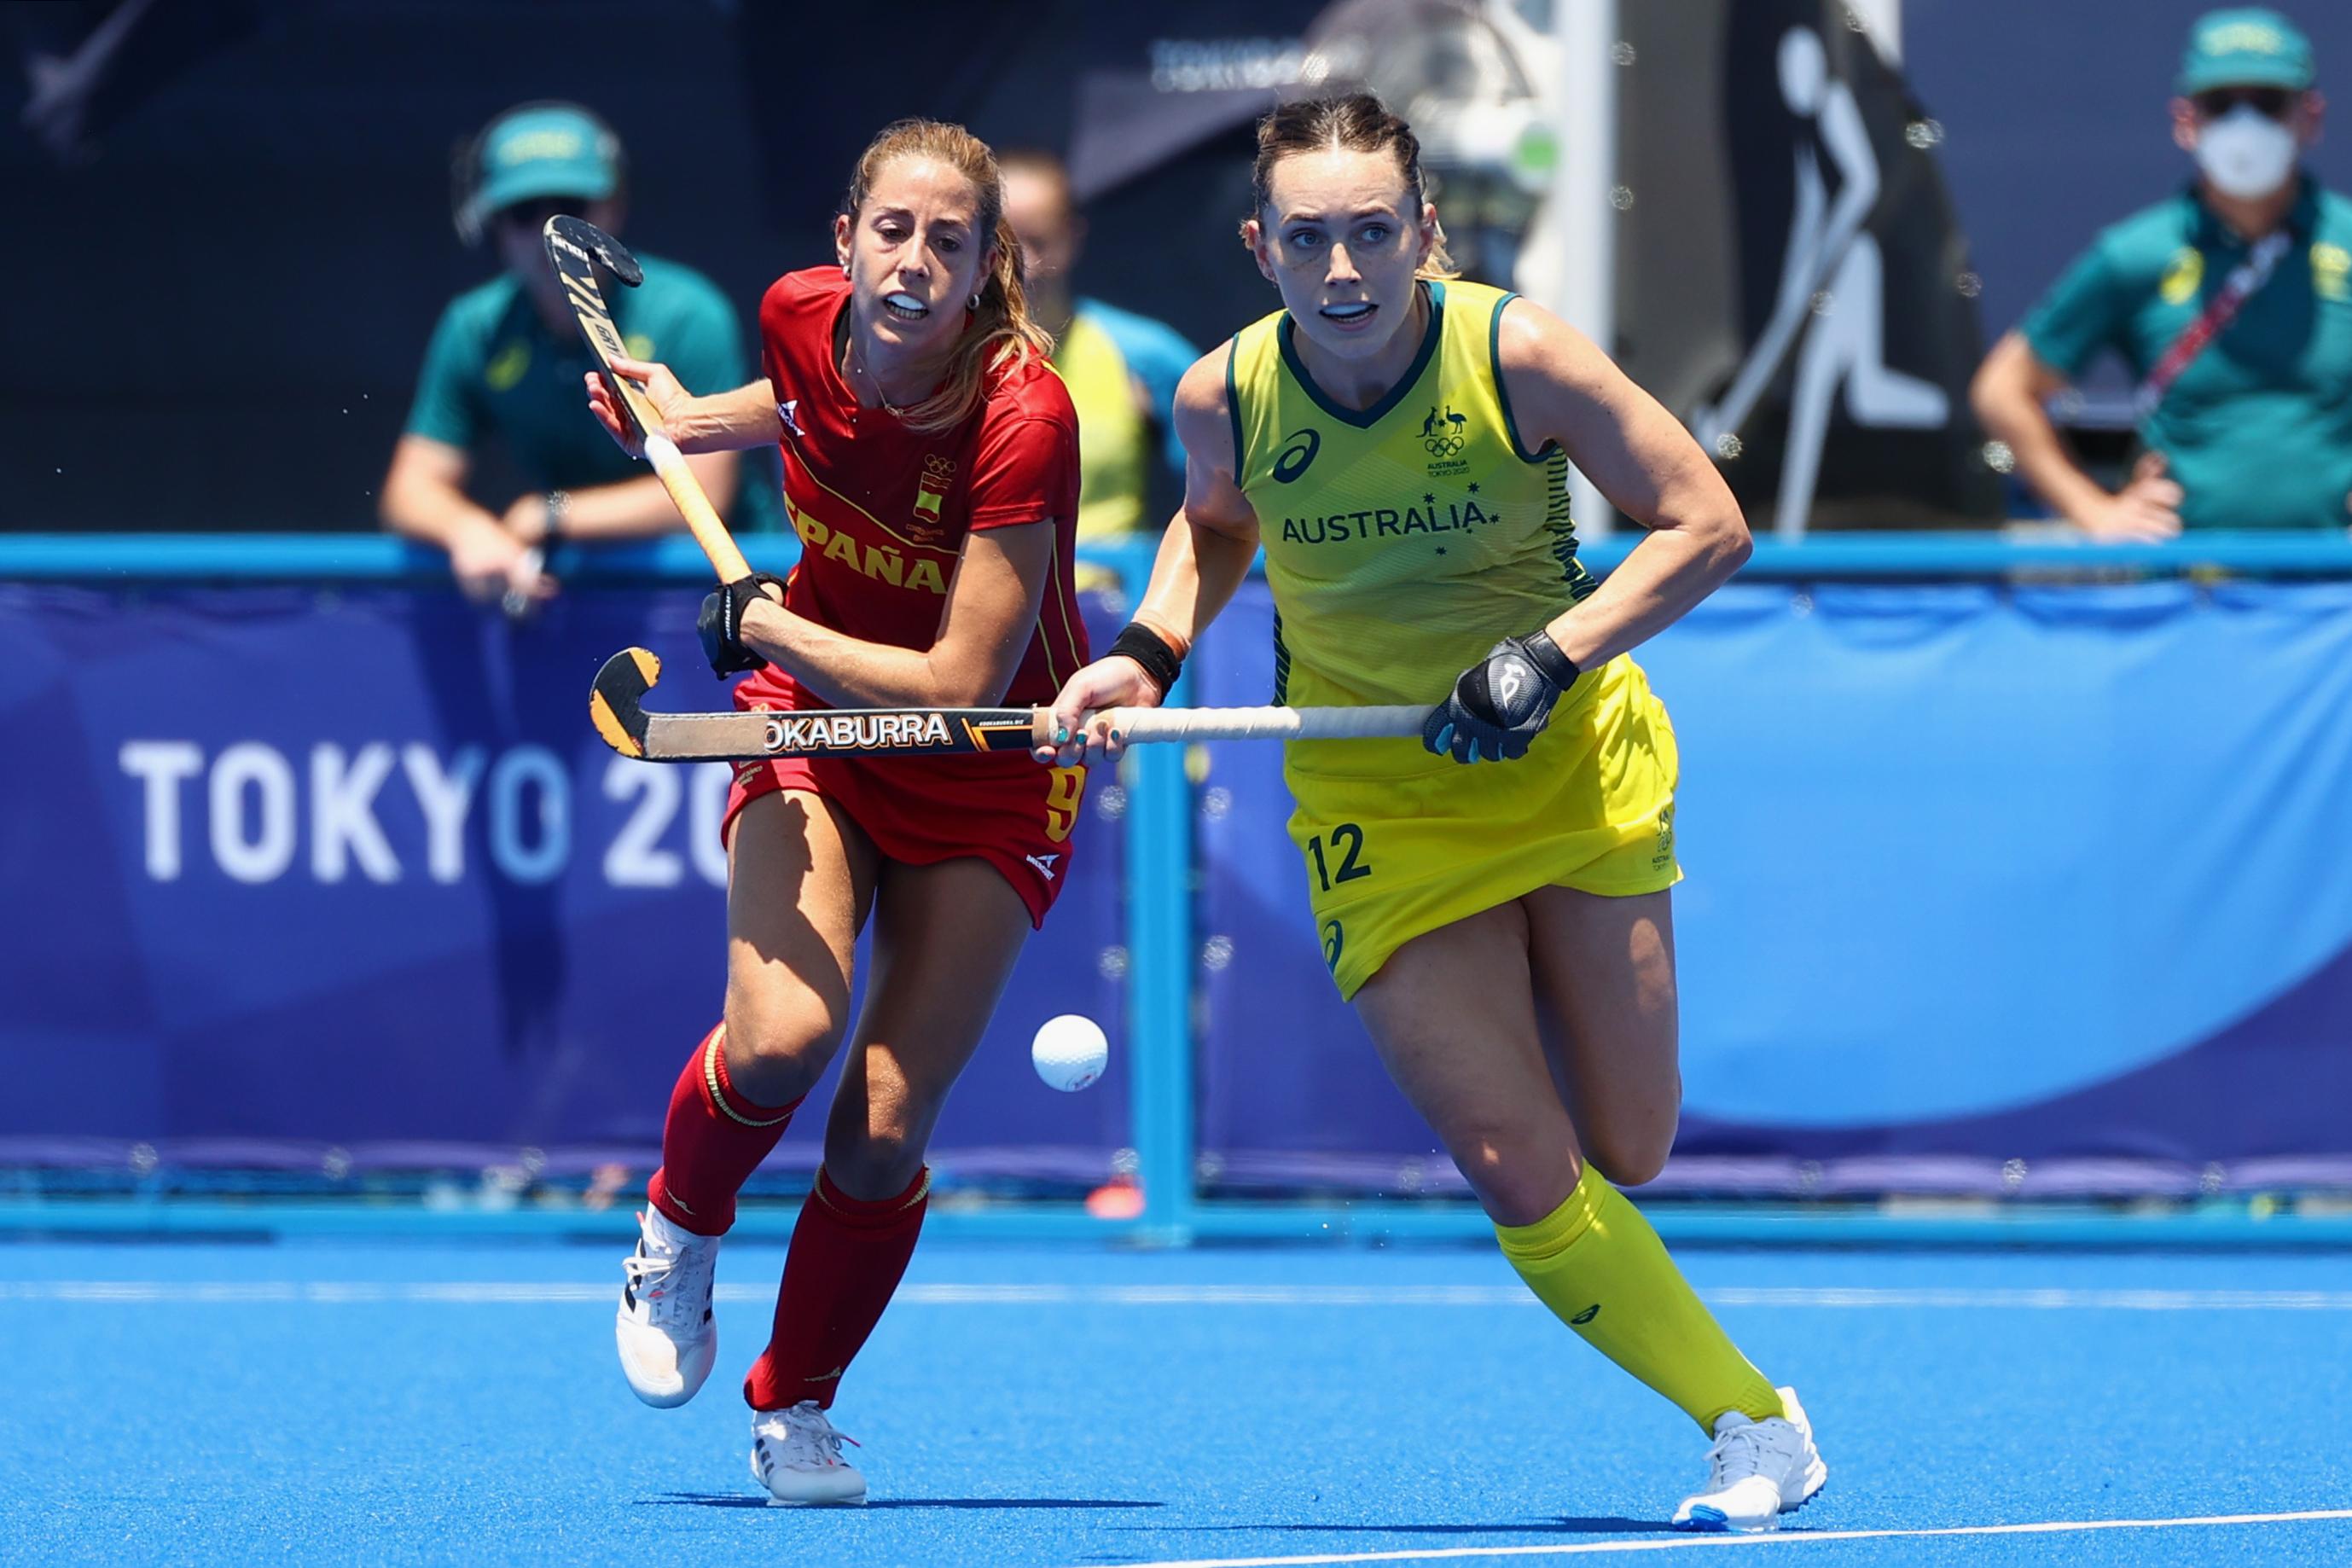 Tokyo 2020 Olympics - Hockey - Women's Pool B - Australia v Spain - Oi Hockey Stadium, Tokyo, Japan - July 25, 2021. Maria Lopez of Spain in action with Greta Hayes of Australia. REUTERS/Siphiwe Sibeko